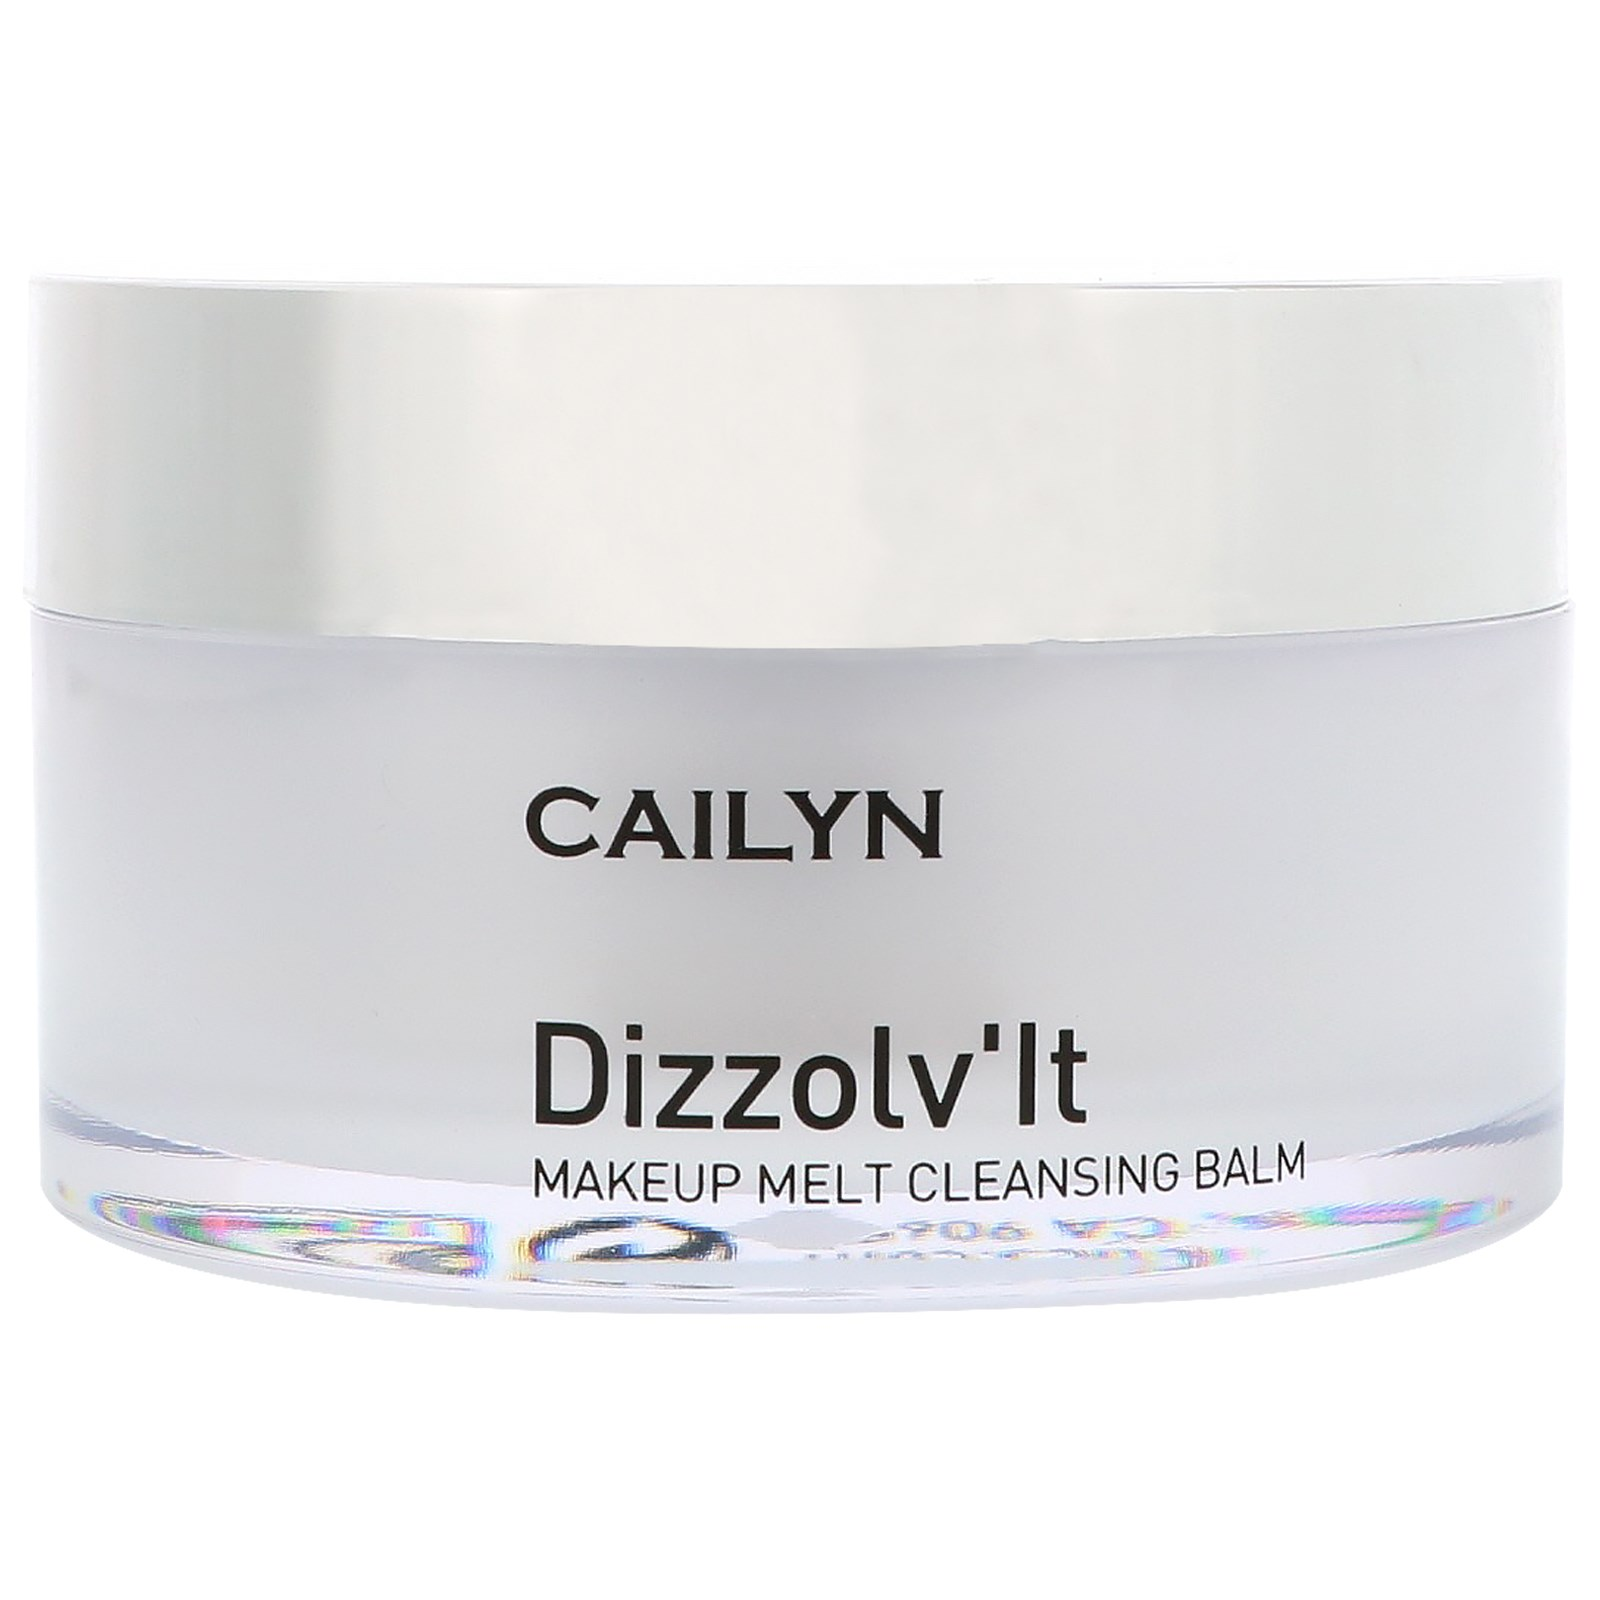 Cailyn - DizzolvIt Makeup Melt Cleansing Balm - 1.7 oz. (pack of 4) Hyalogic LLC, Episilk, Coenzyme Q10 Face Serum, 1 fl oz (pack of 1)